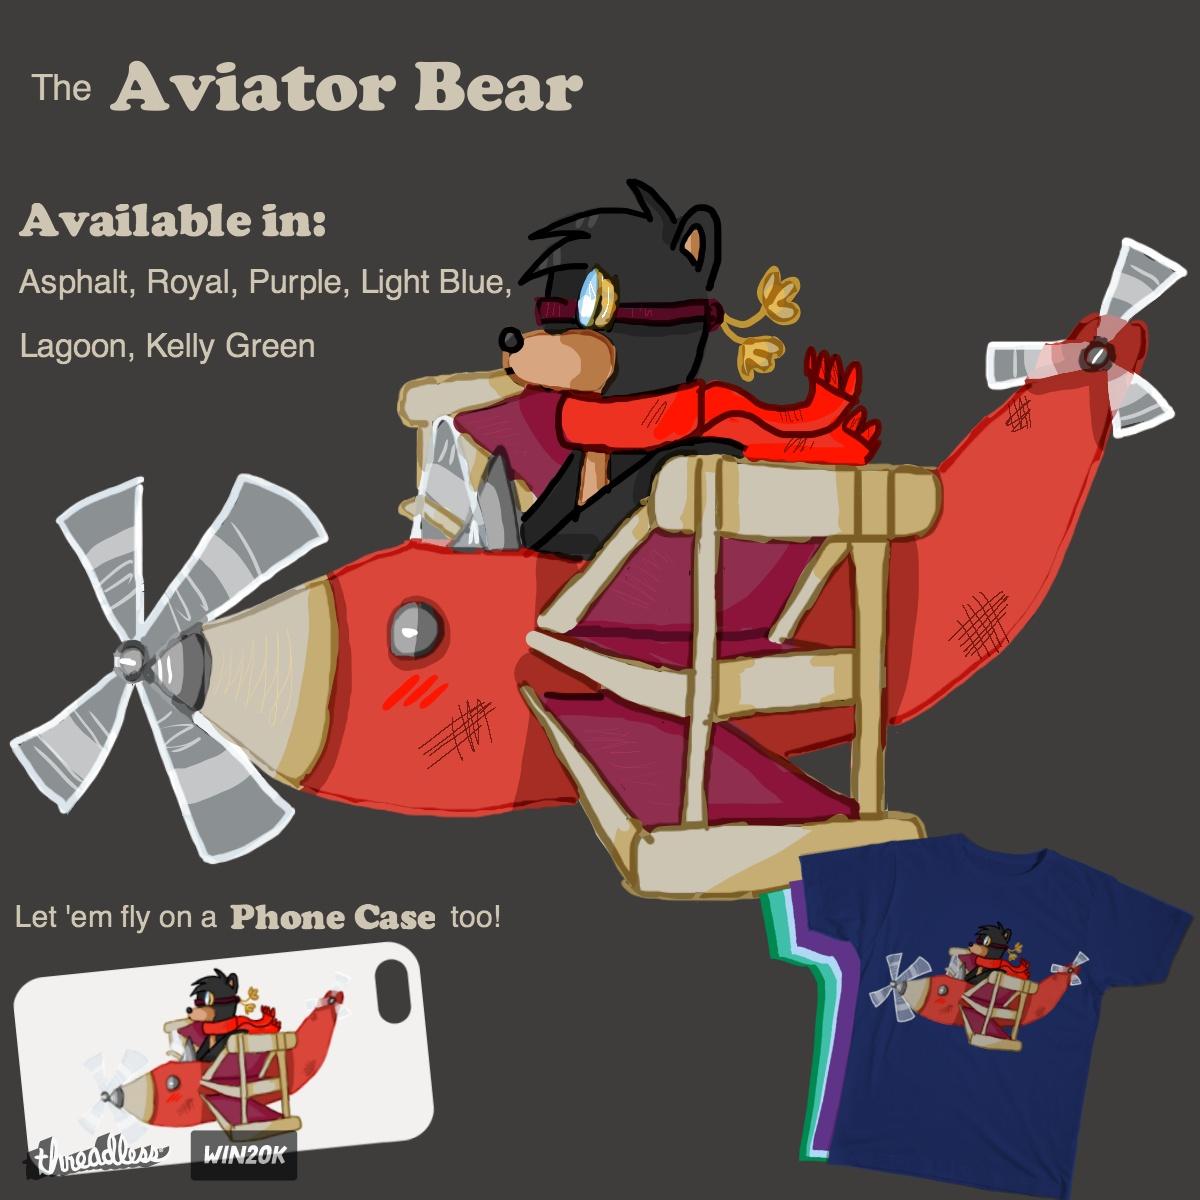 Aviator Bear by jairart on Threadless